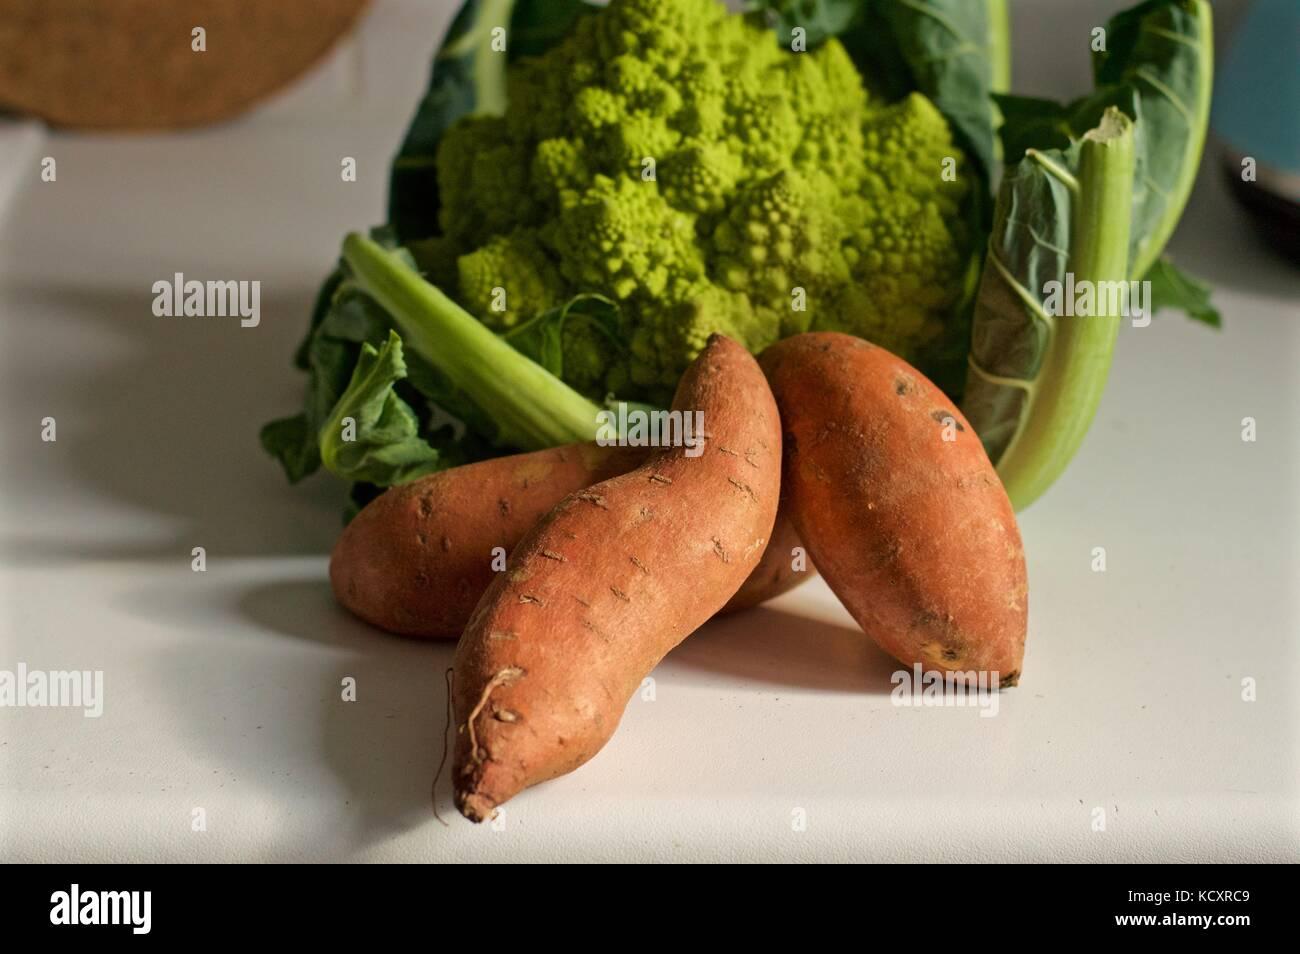 Romanesco Broccoli and sweet potatos - Stock Image